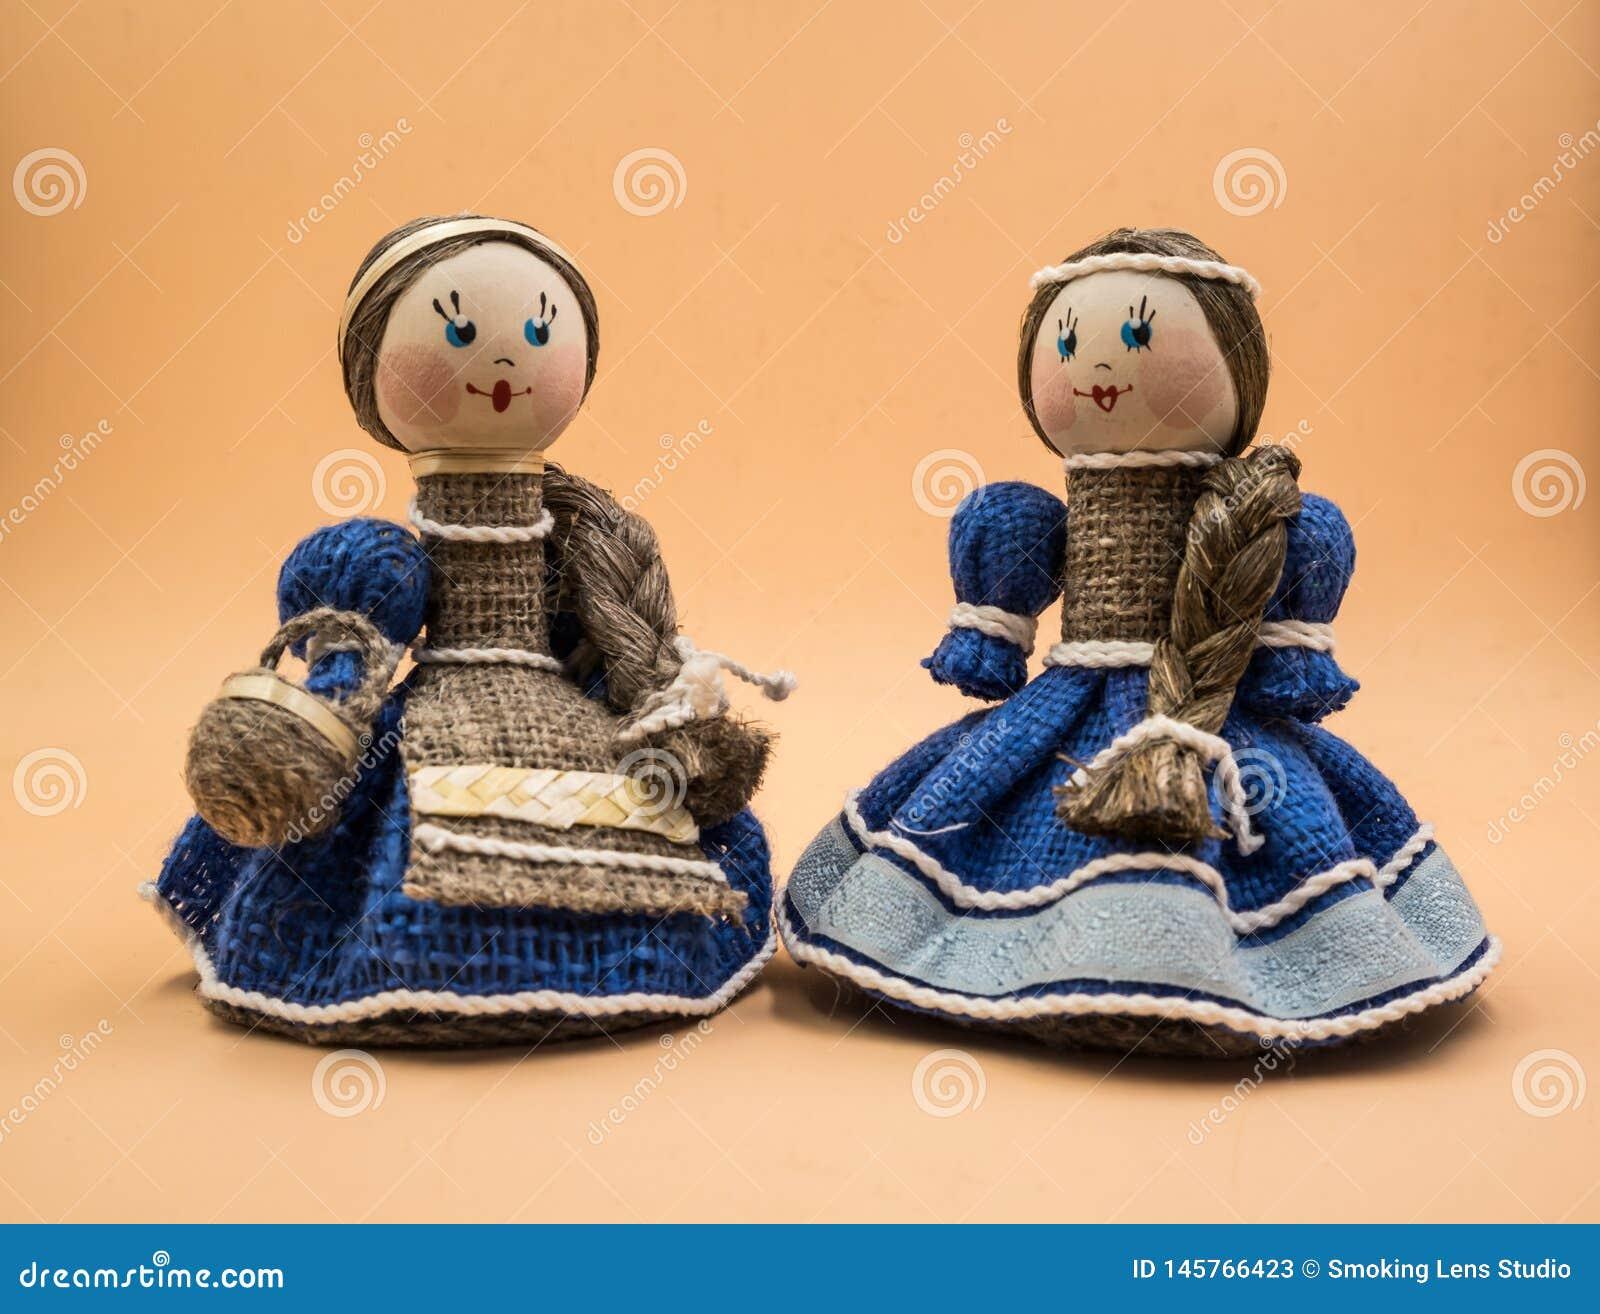 Bellarusianpoppen, speelgoed